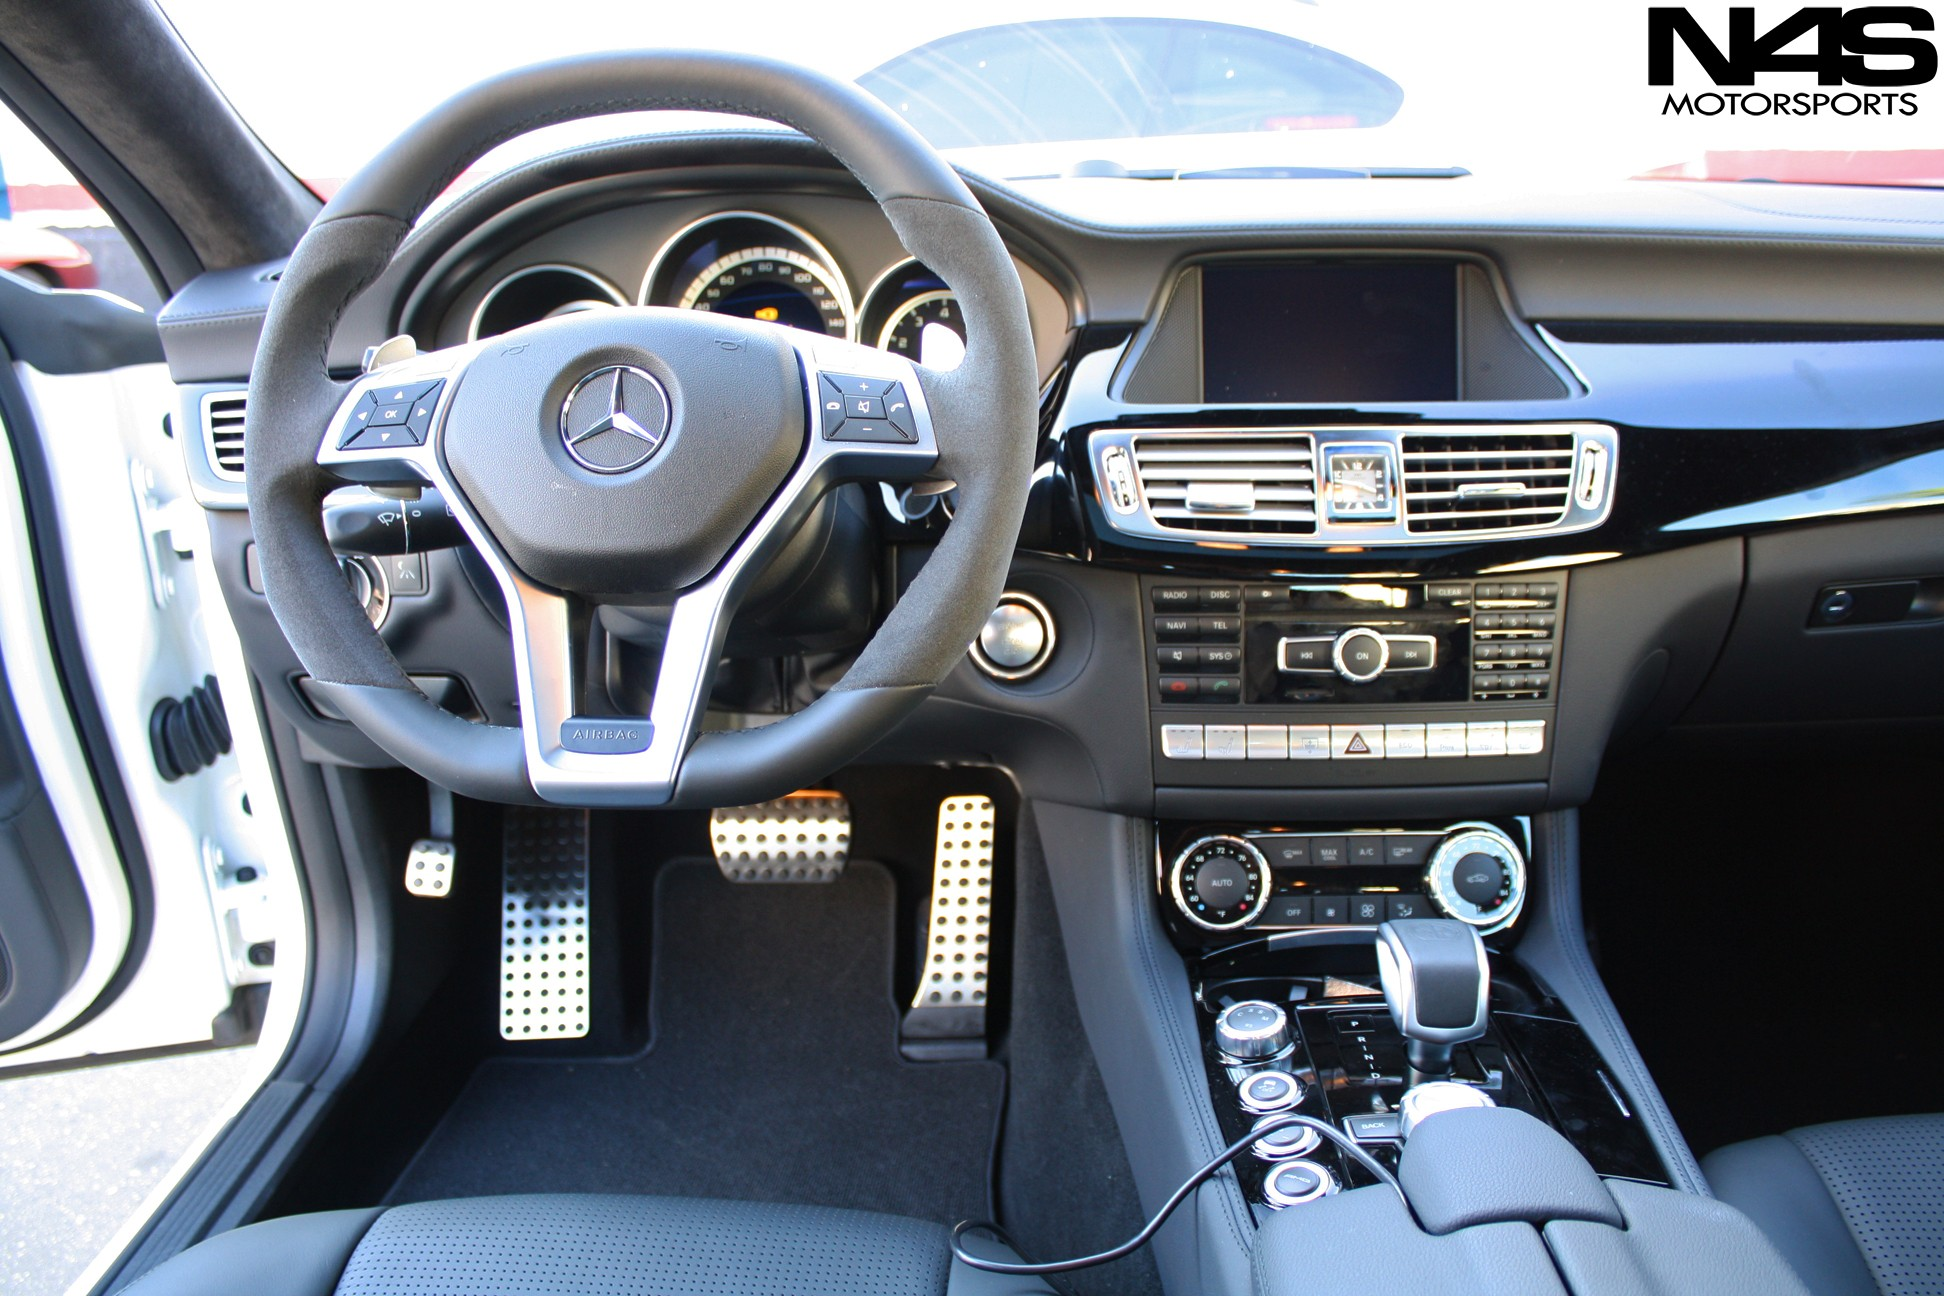 test drive rpt mercedes cla 250 2 0t 211ch bva 7g dct 2013 auto titre. Black Bedroom Furniture Sets. Home Design Ideas